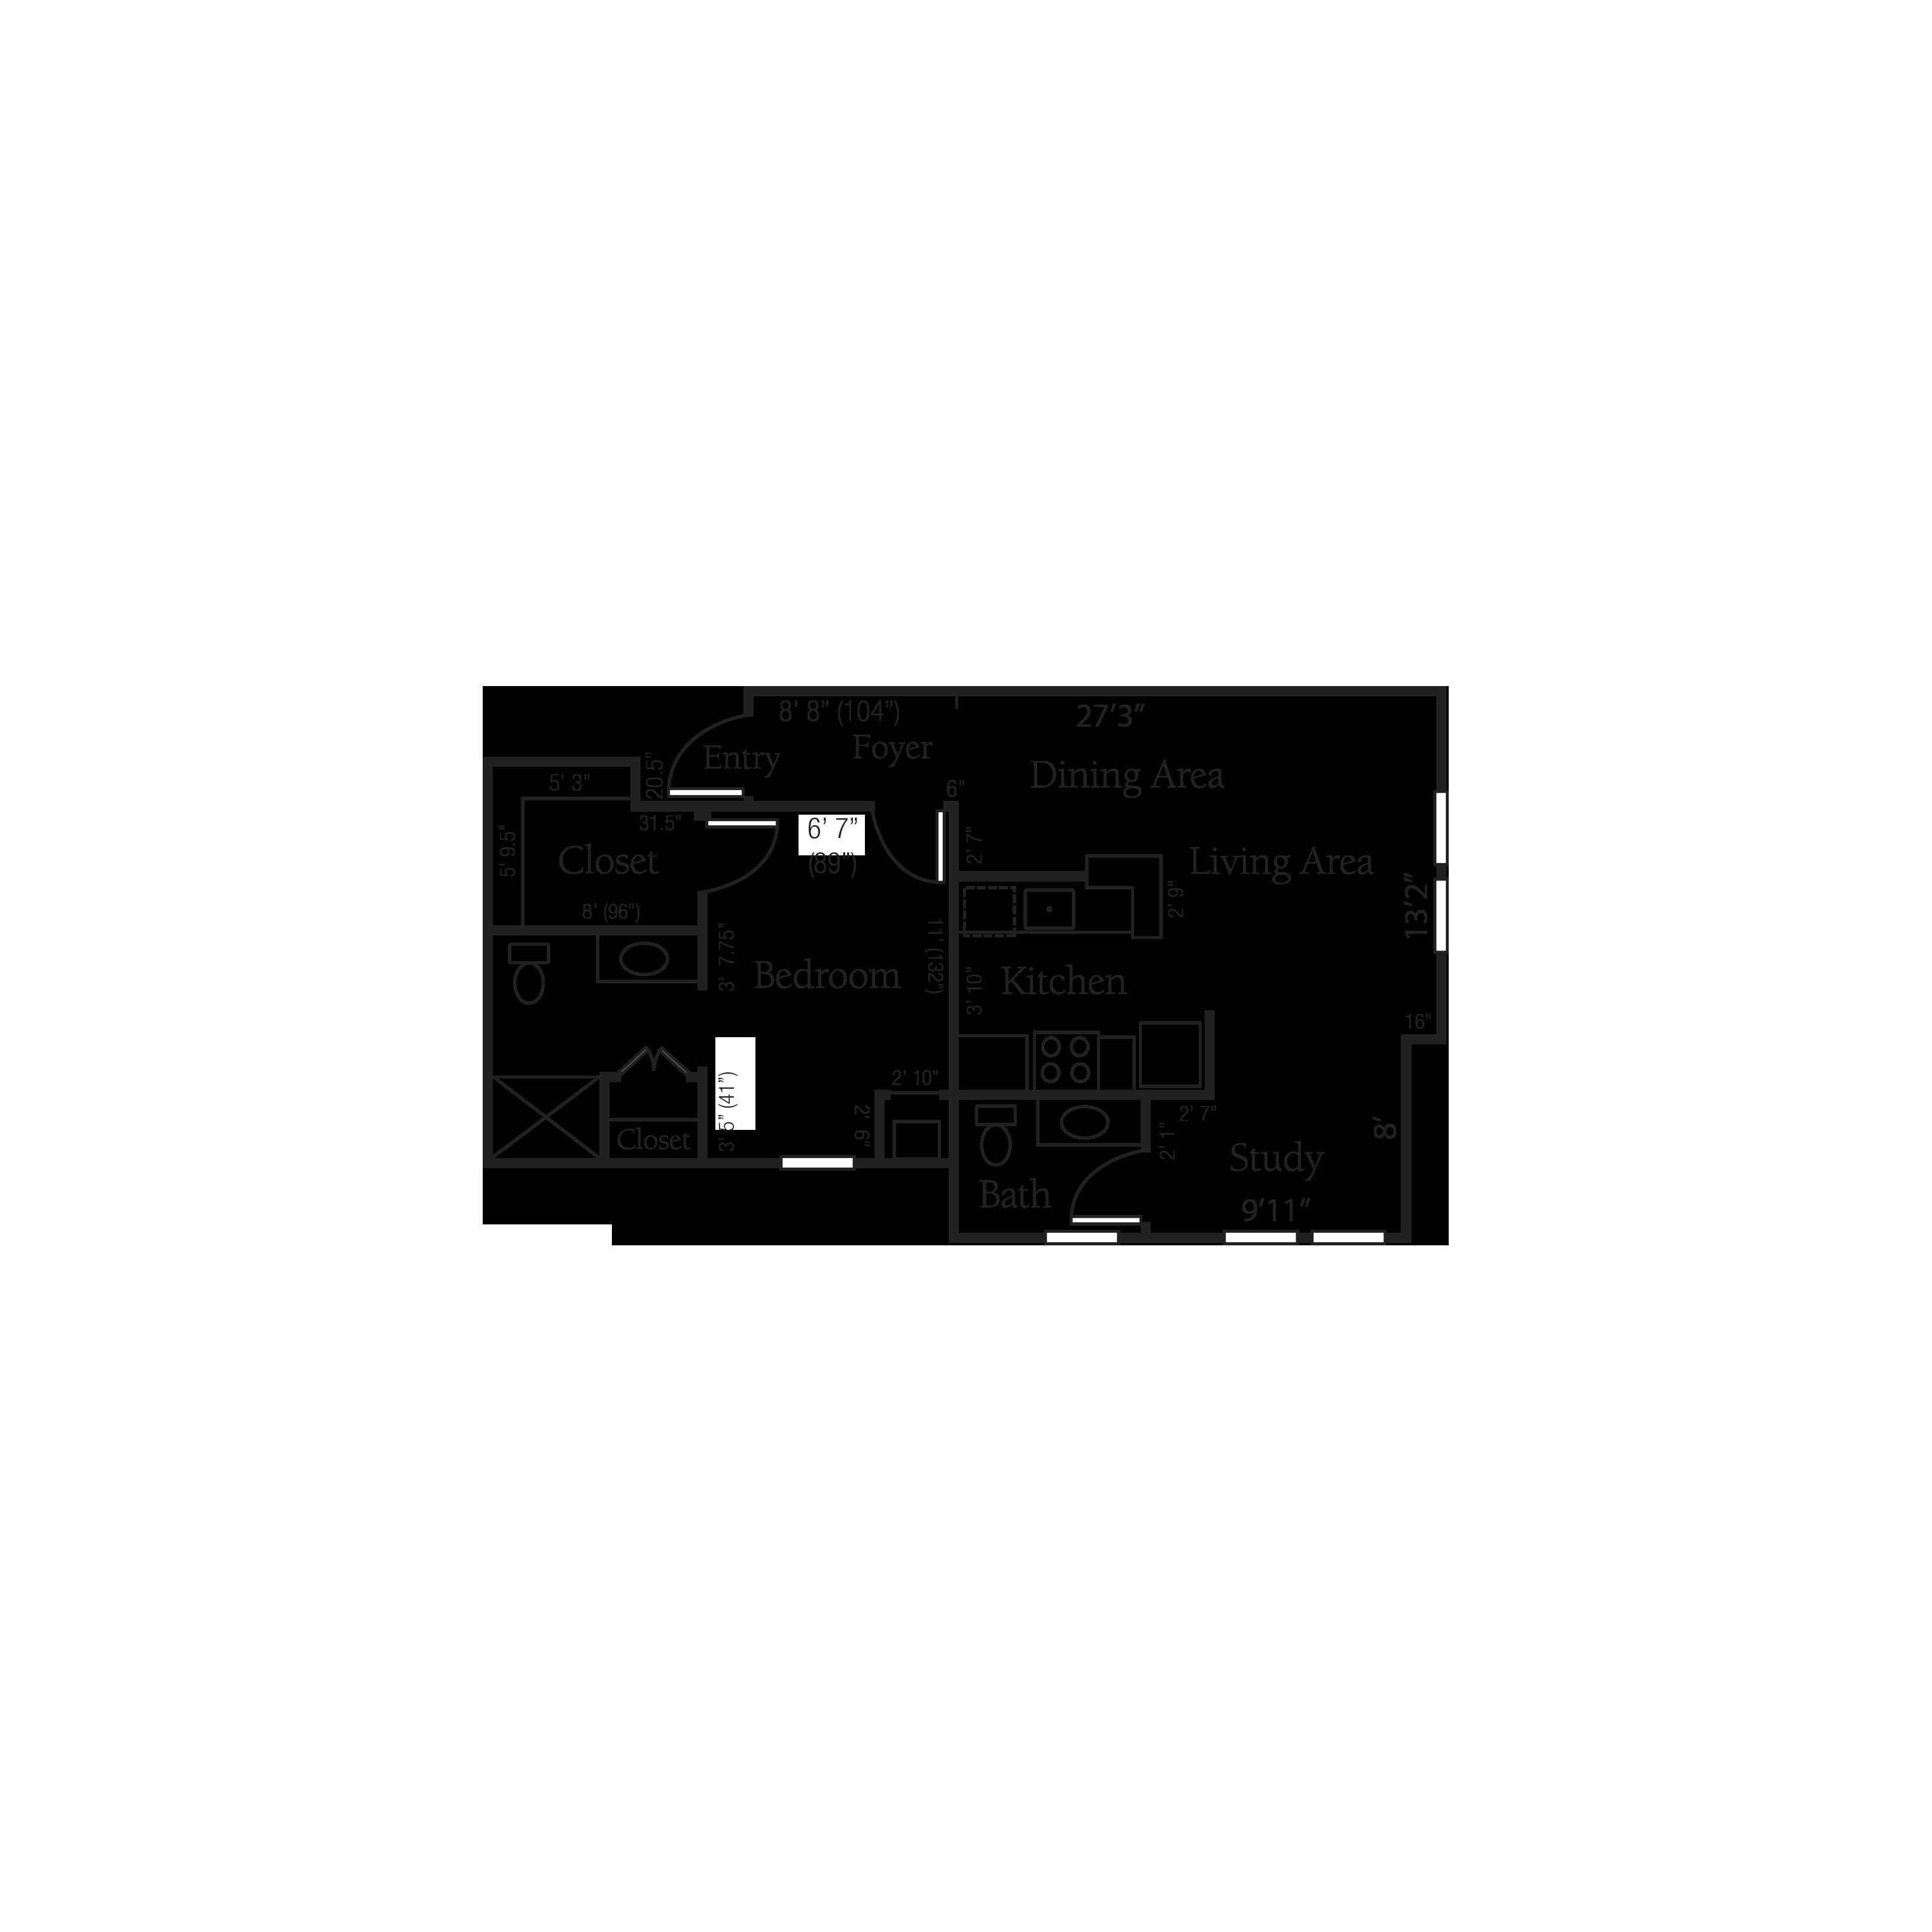 The Kensington floor plan